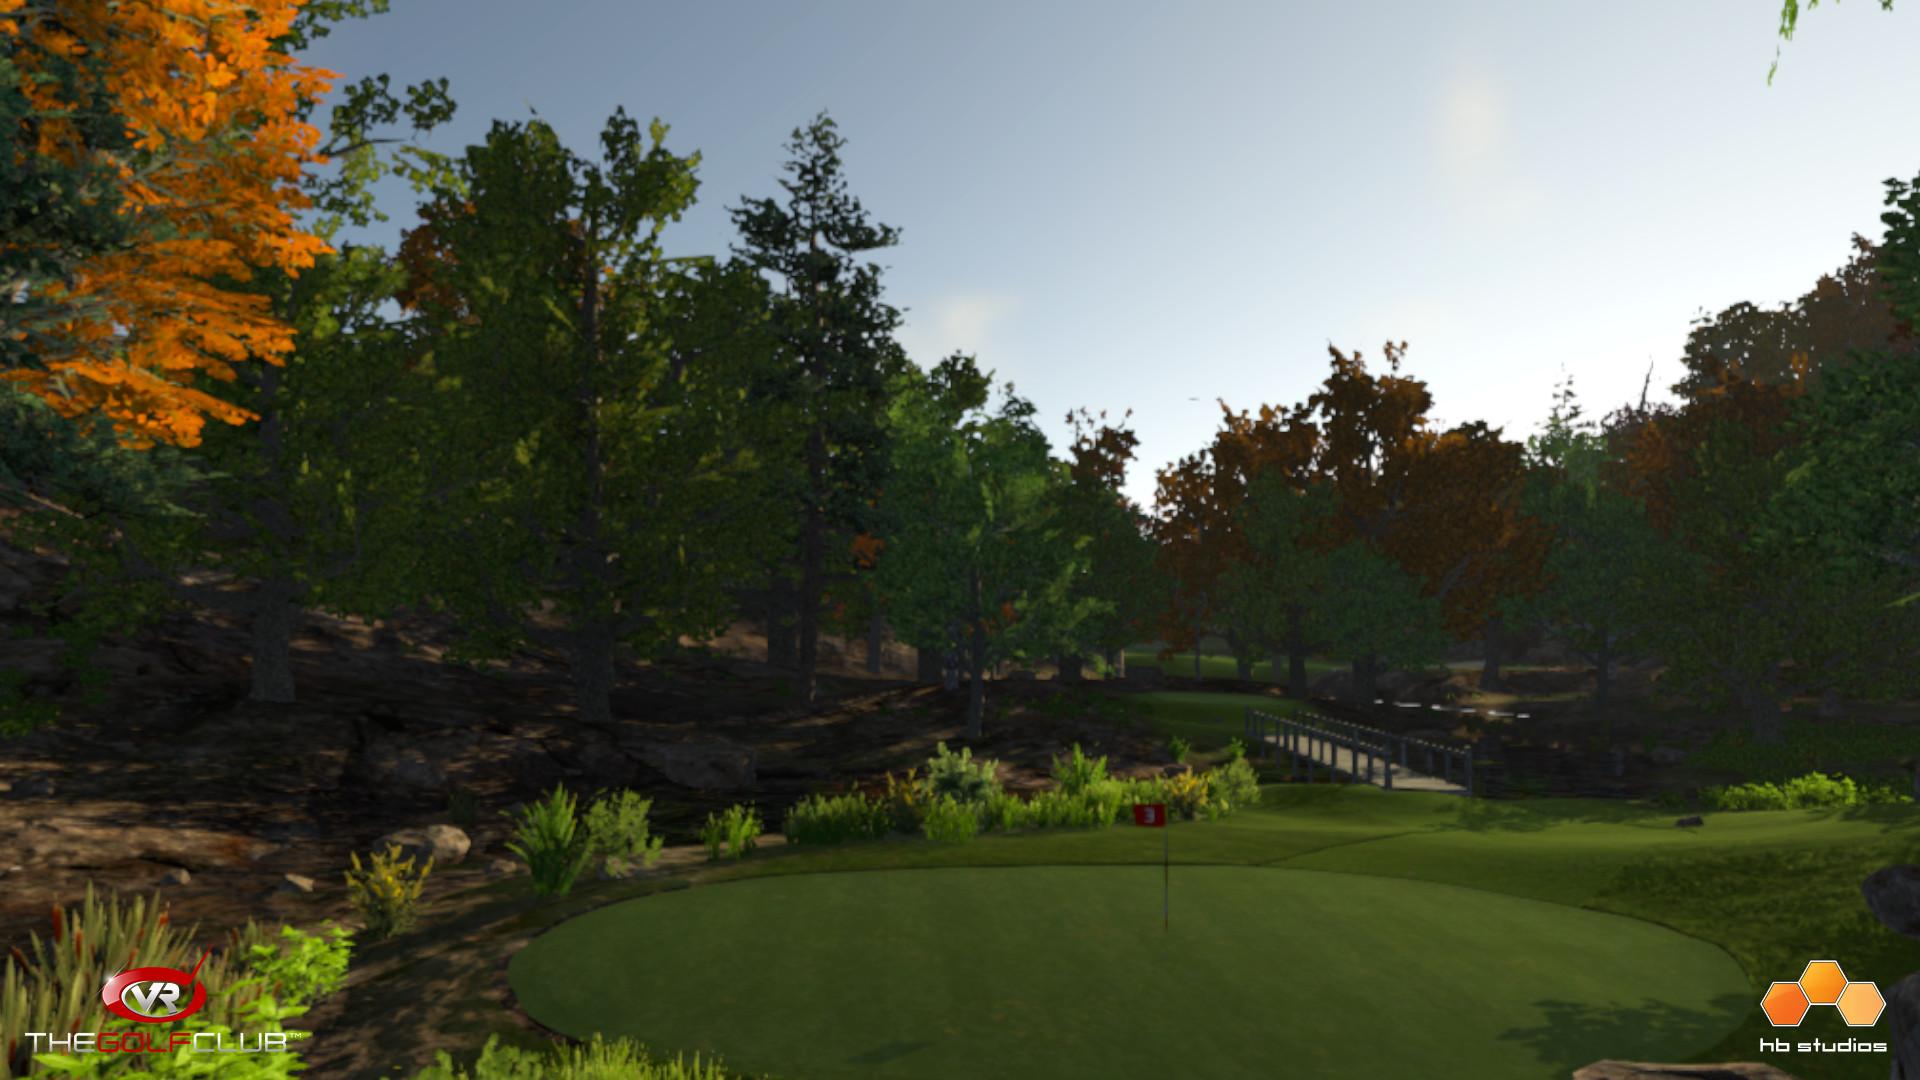 VRゲーム、The Golf Club VR、ゲームイメージ